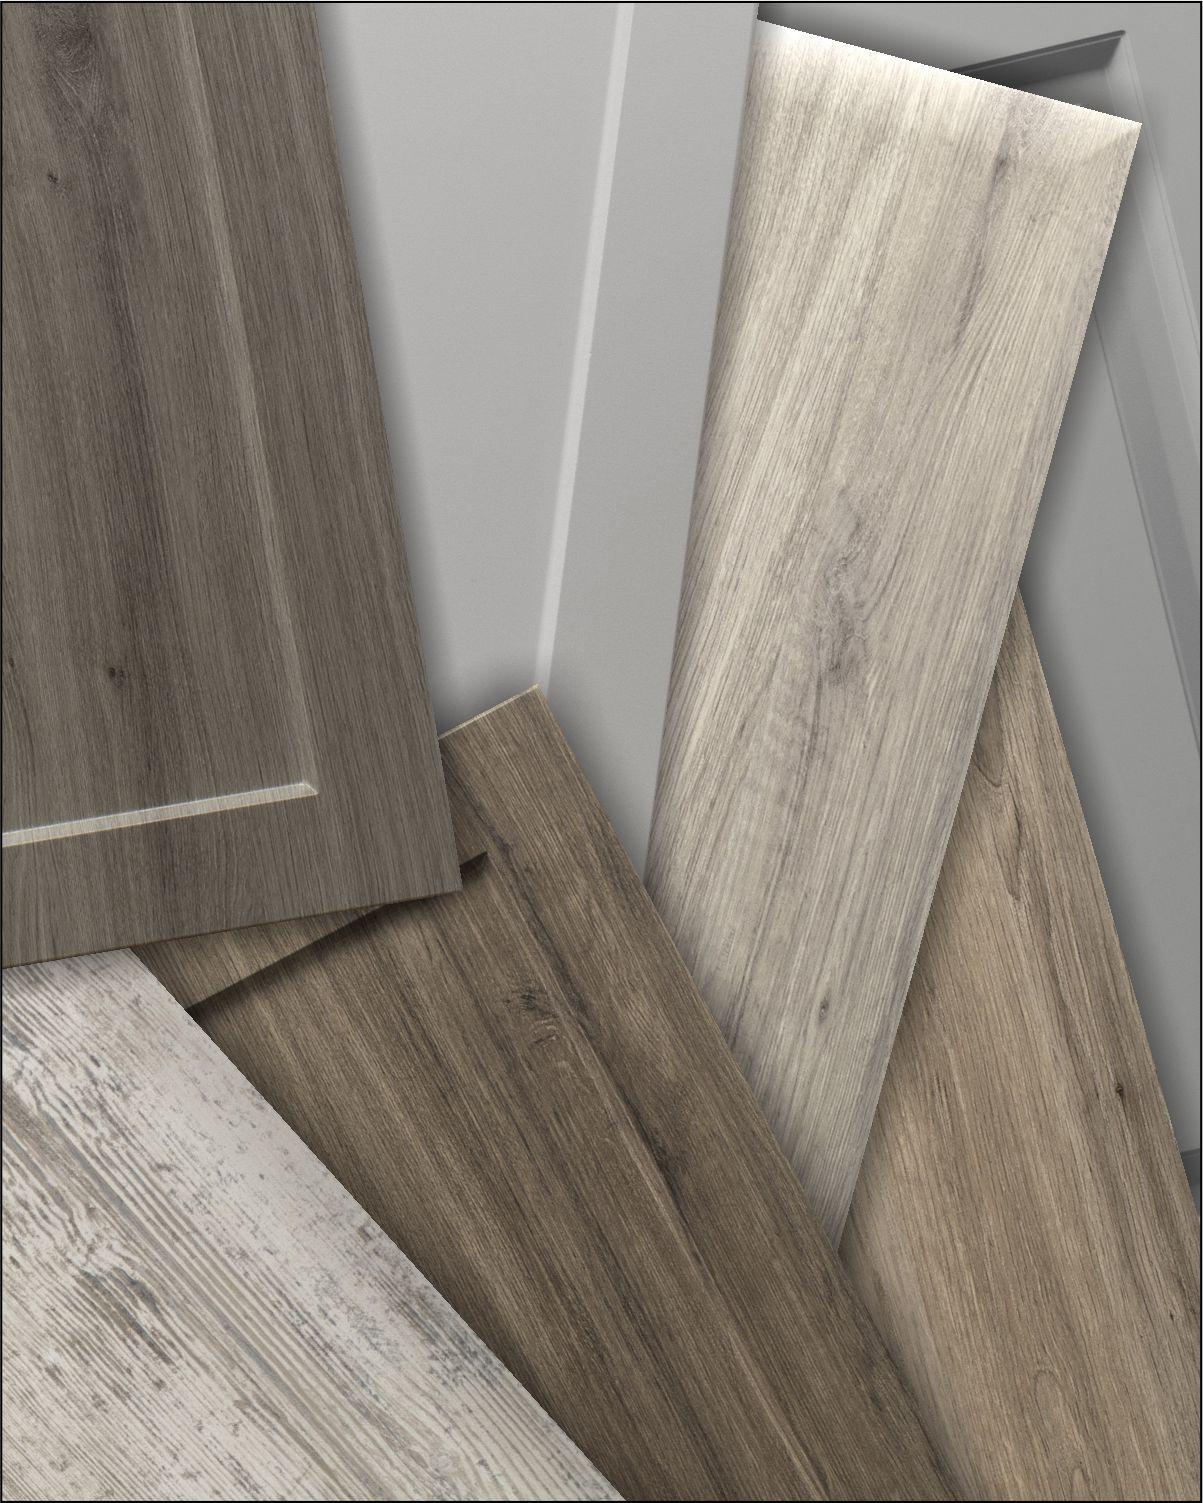 Rtf Kitchen Cabinet Doors: Thermofoil Cabinet Door